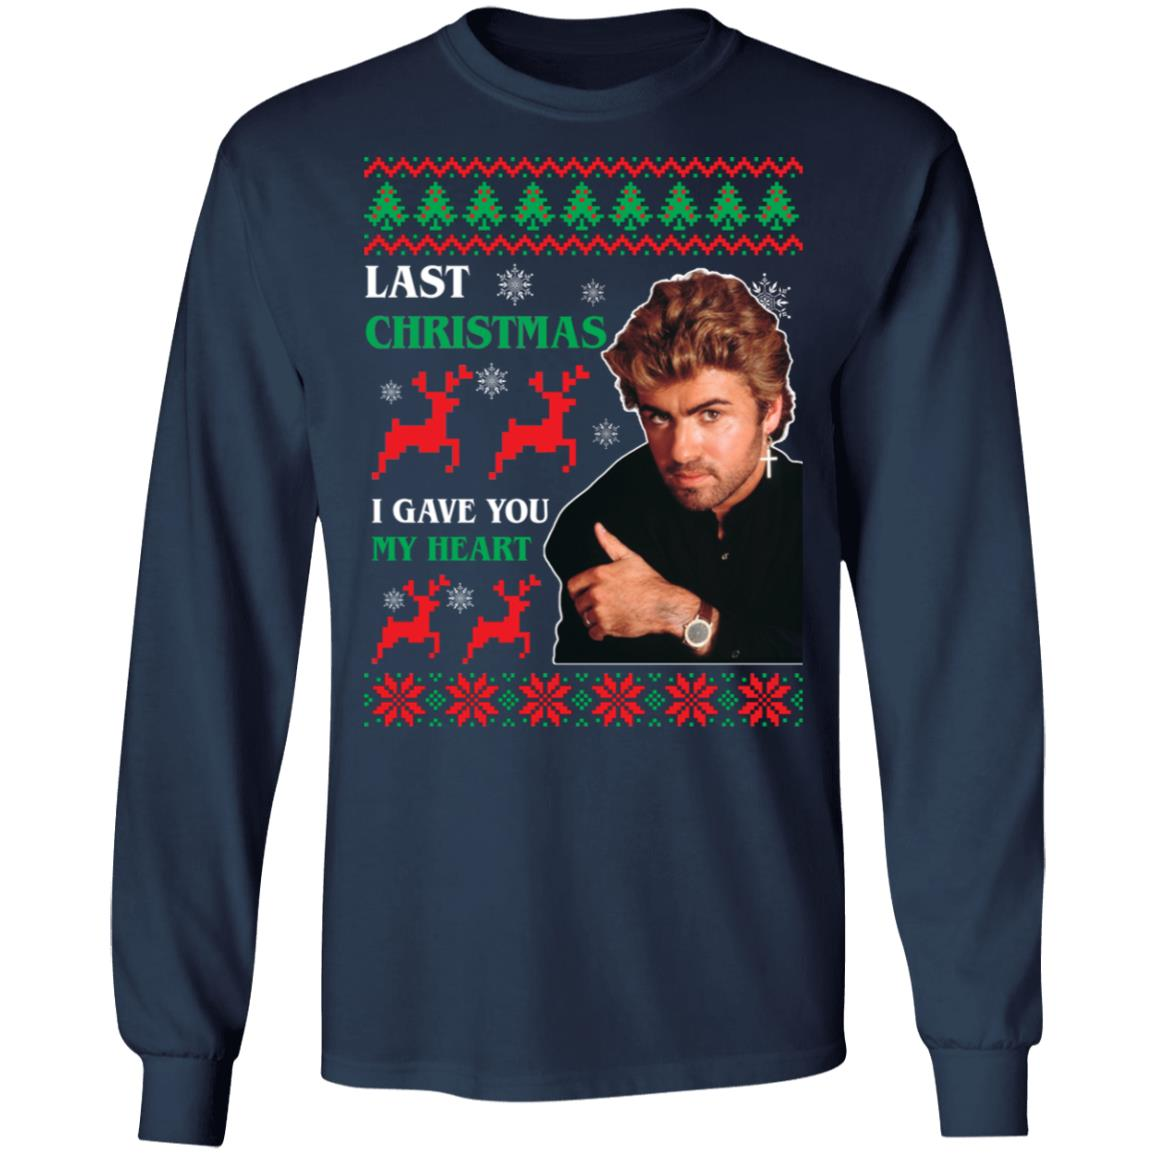 George Michaels Last Christmas I gave you my heart sweater, hoodie, long sleeve